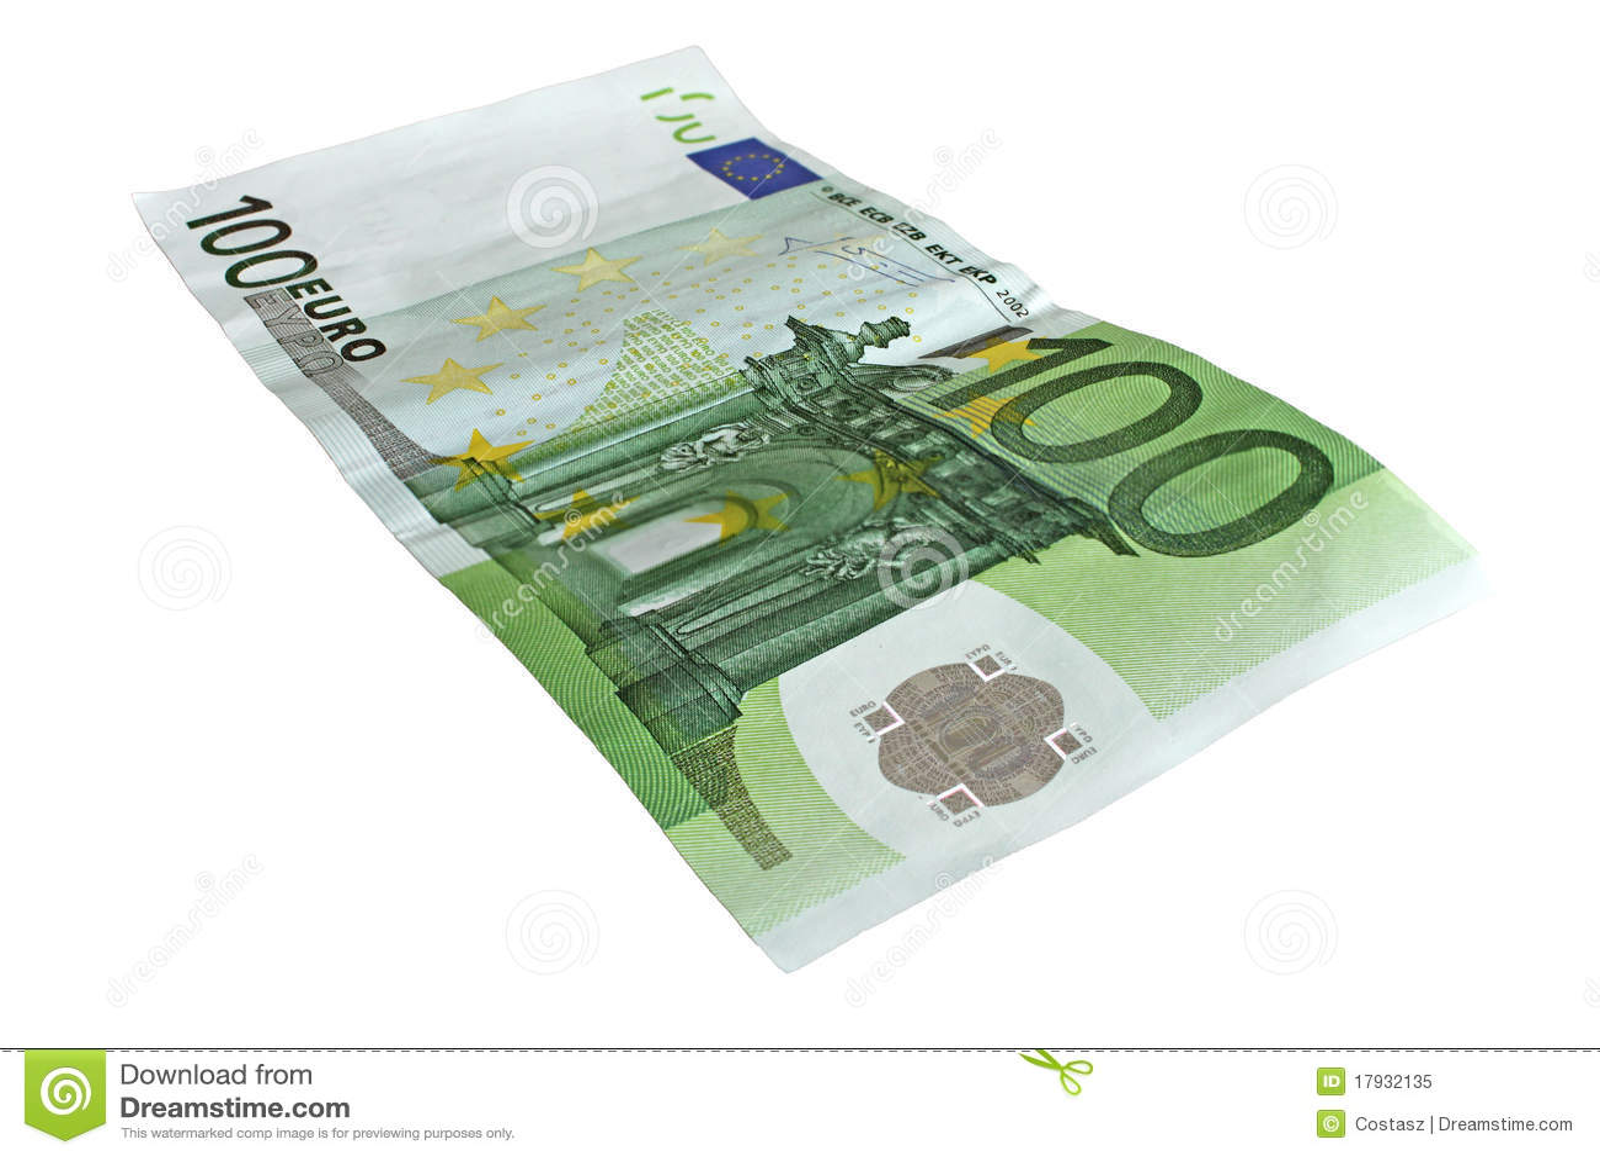 100 euros royalty free stock photo image 17932135 for Wohnlandschaft 100 euro